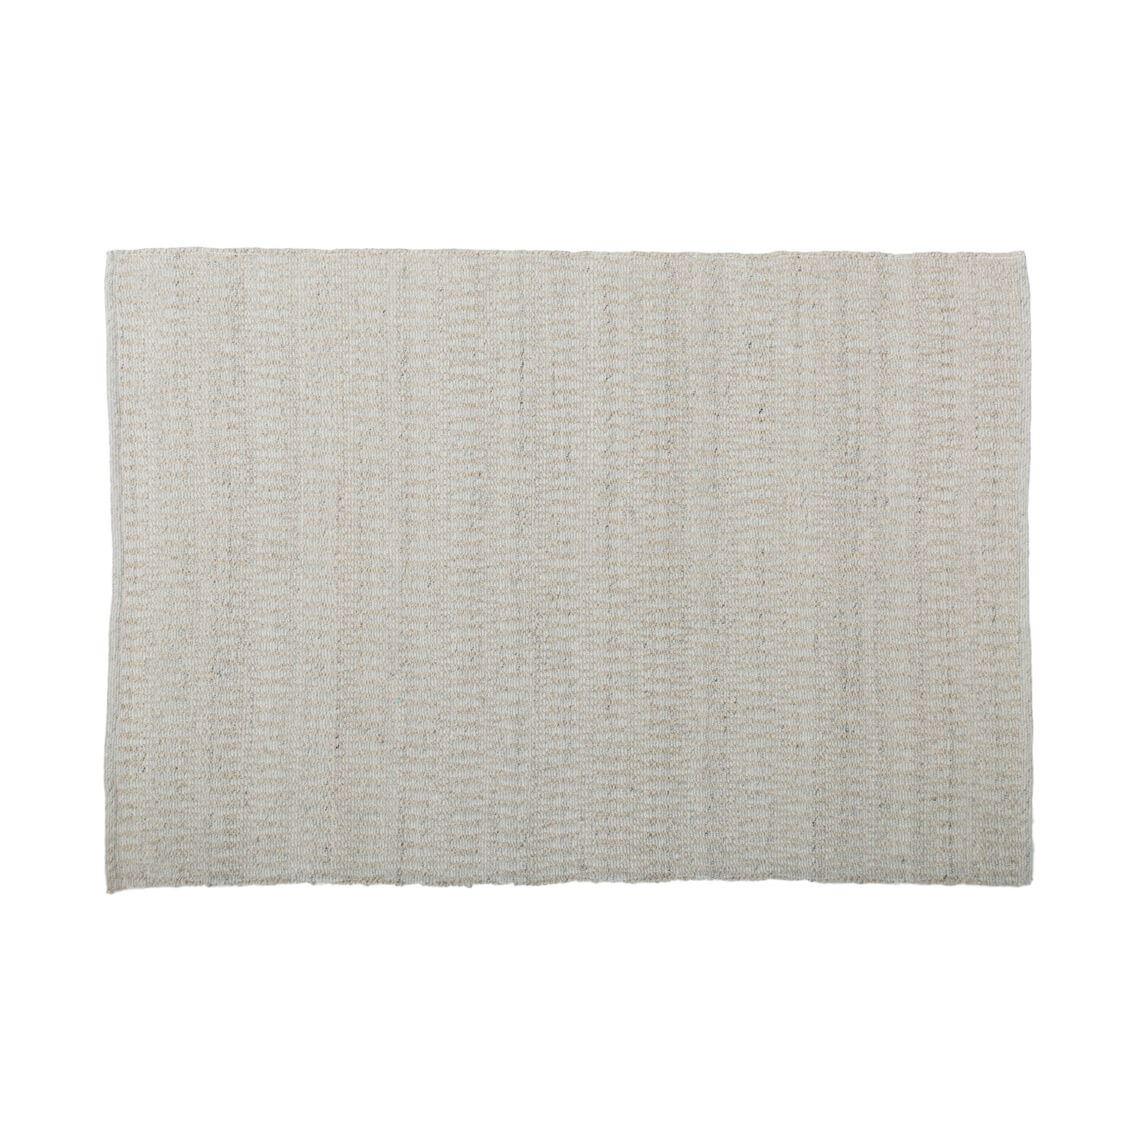 Sandro Floor Rug Size W 160cm x D 230cm x H 1cm in Grey Freedom